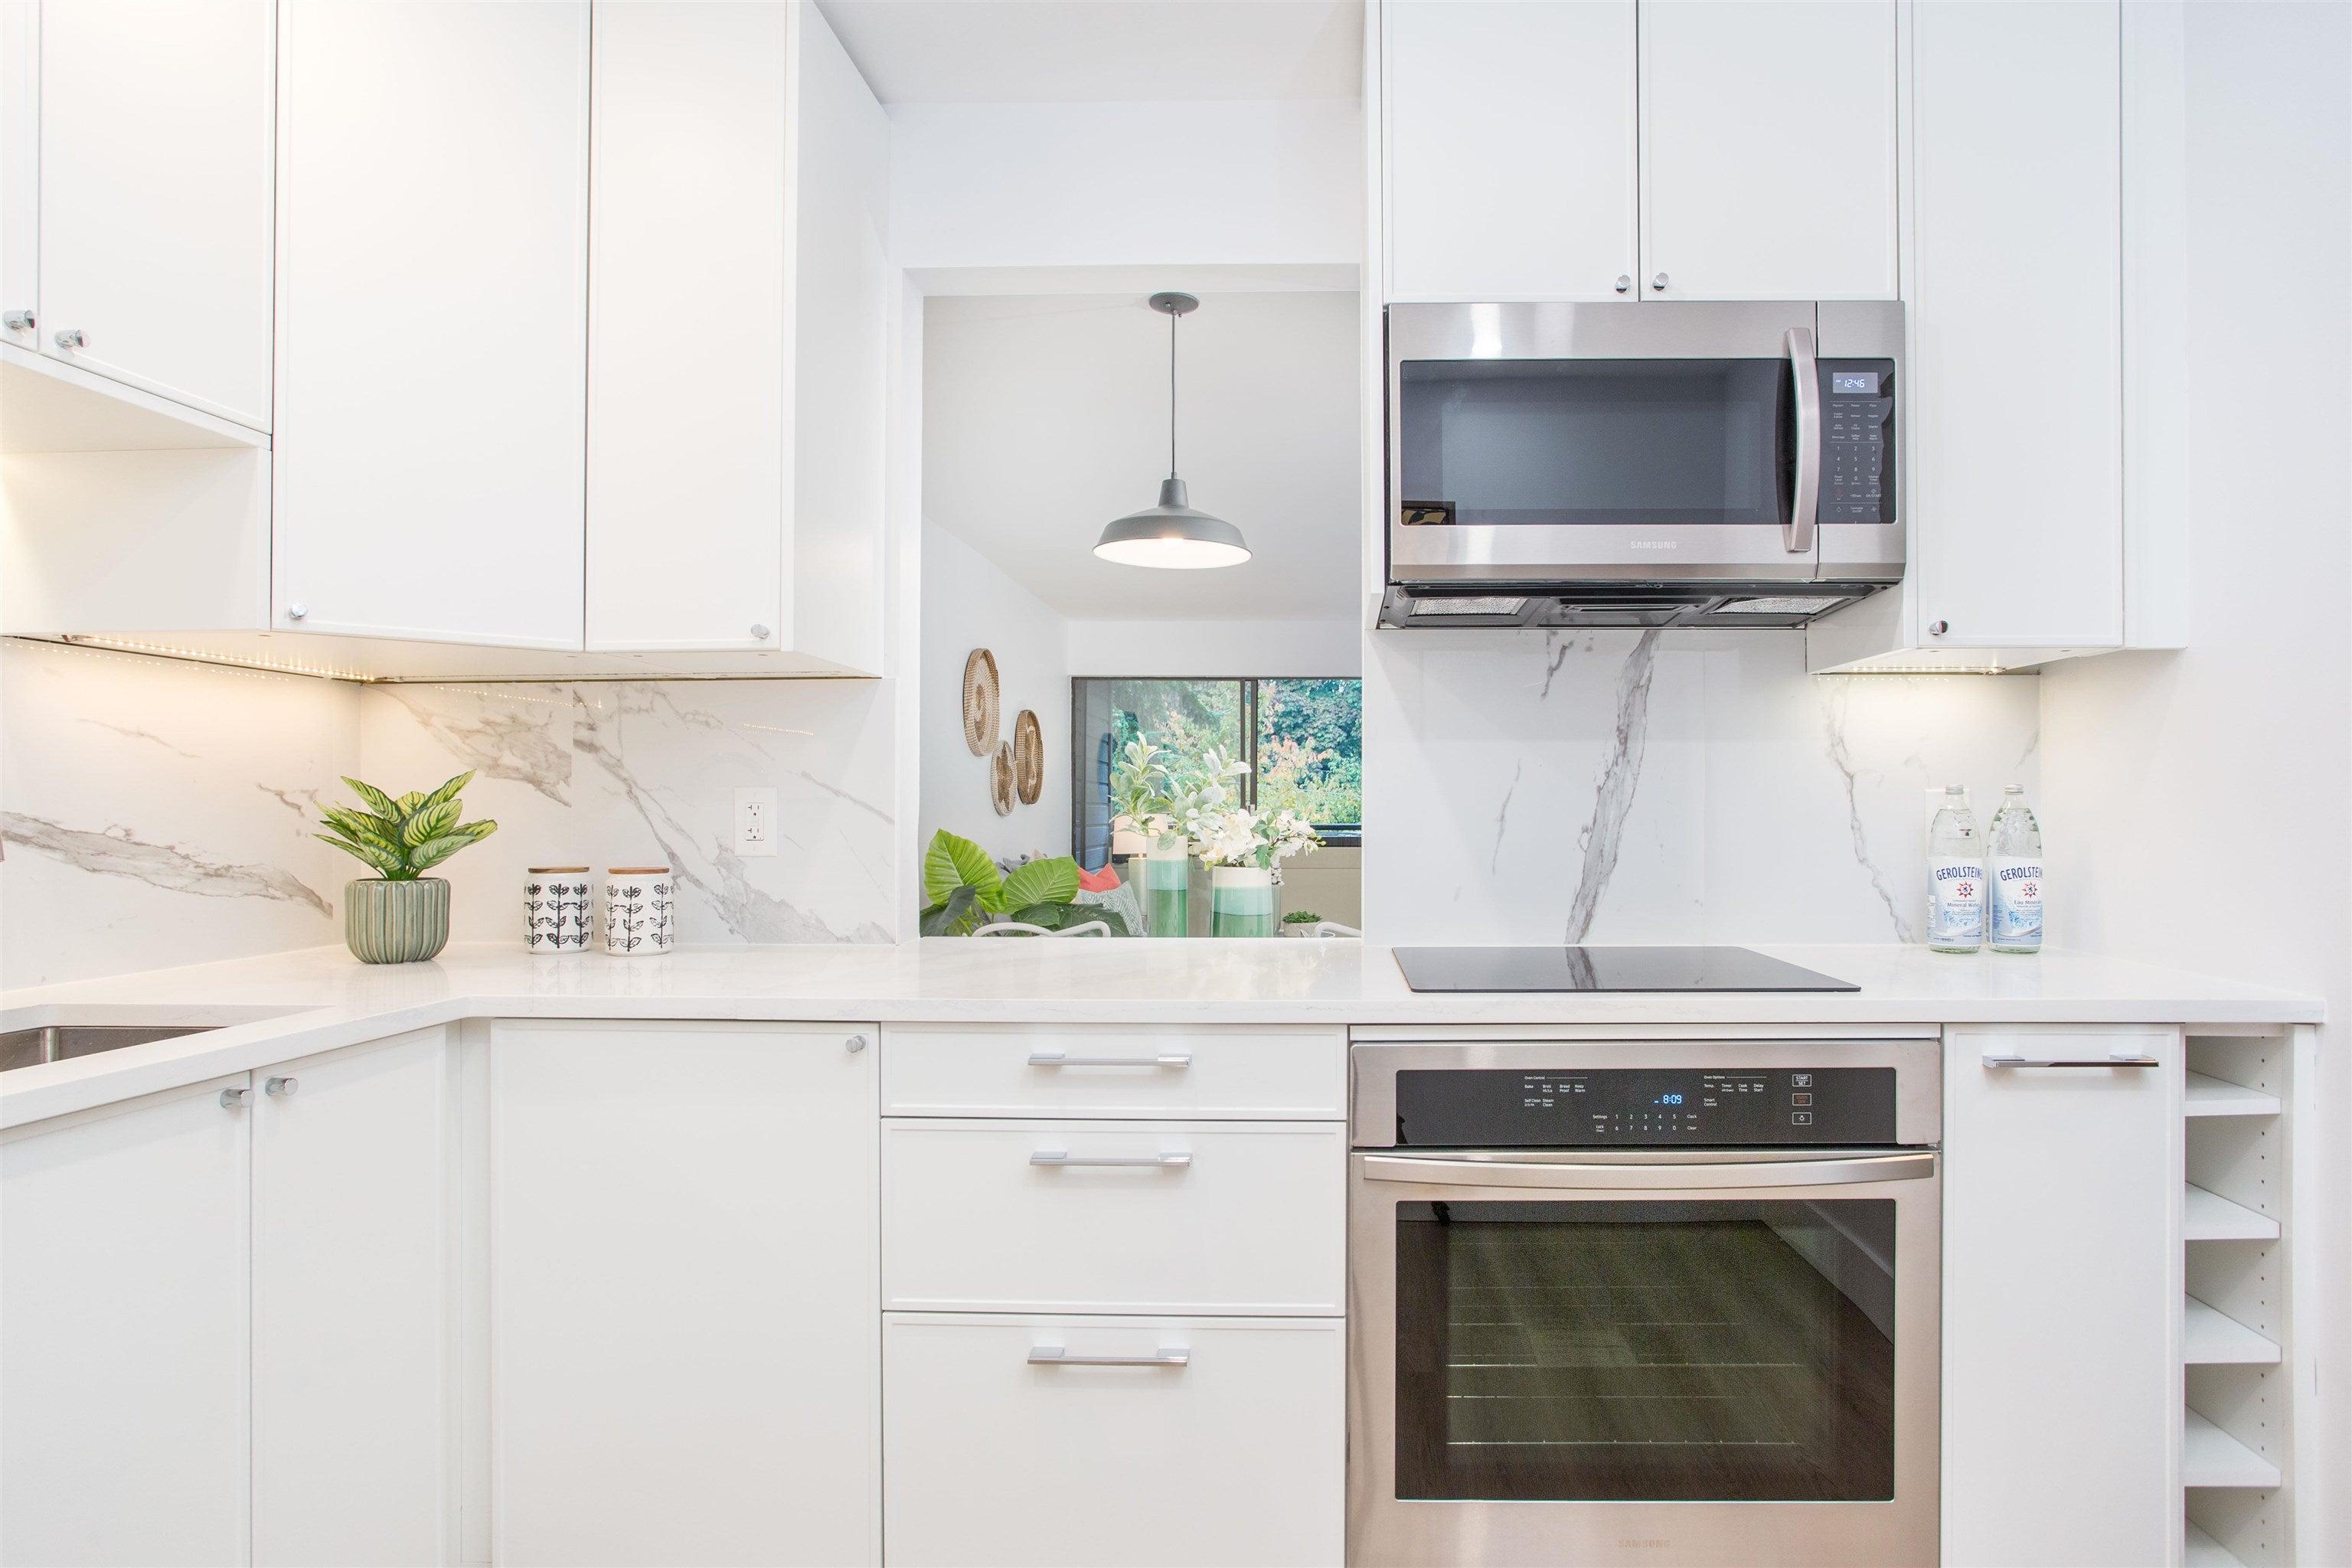 304 1710 W 13TH AVENUE - Fairview VW Apartment/Condo for sale, 1 Bedroom (R2626992)